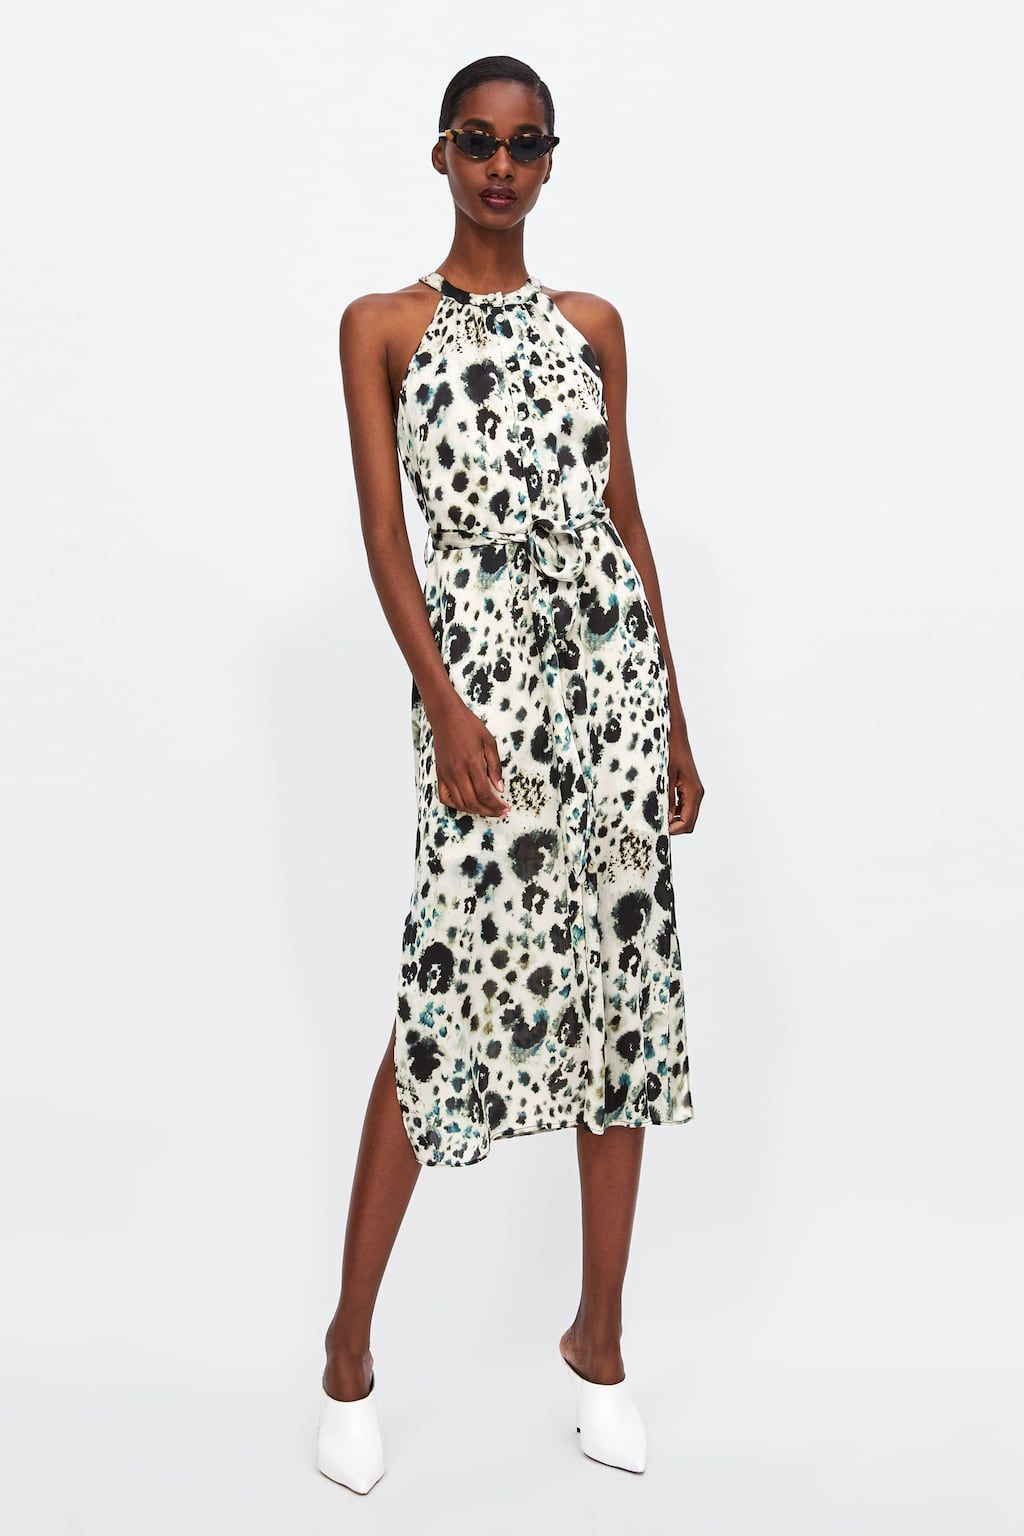 ZARA - WOMAN - LEOPARD PRINT HALTERNECK DRESS | Halter ...